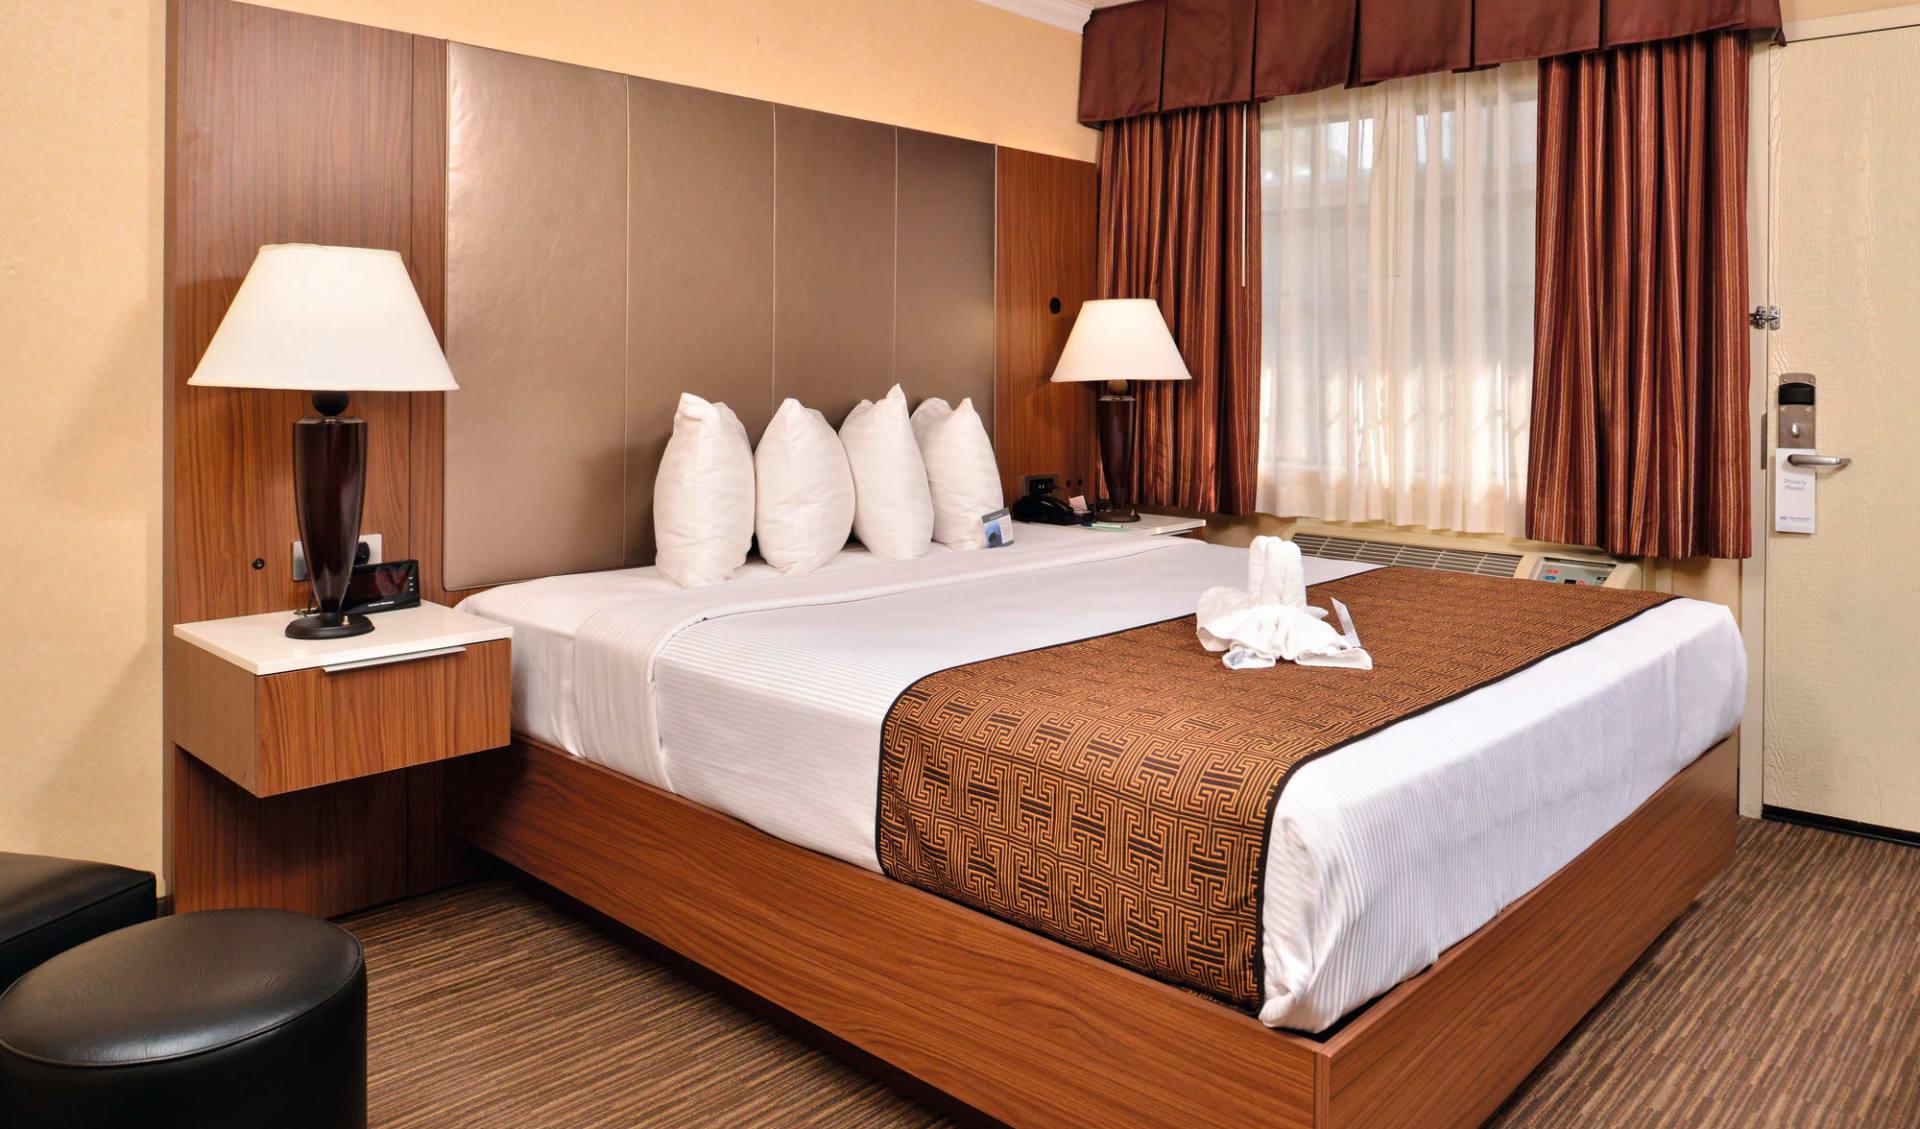 Best Western Hollywood Plaza Inn: BW Hollywood Plaza Inn - Standard